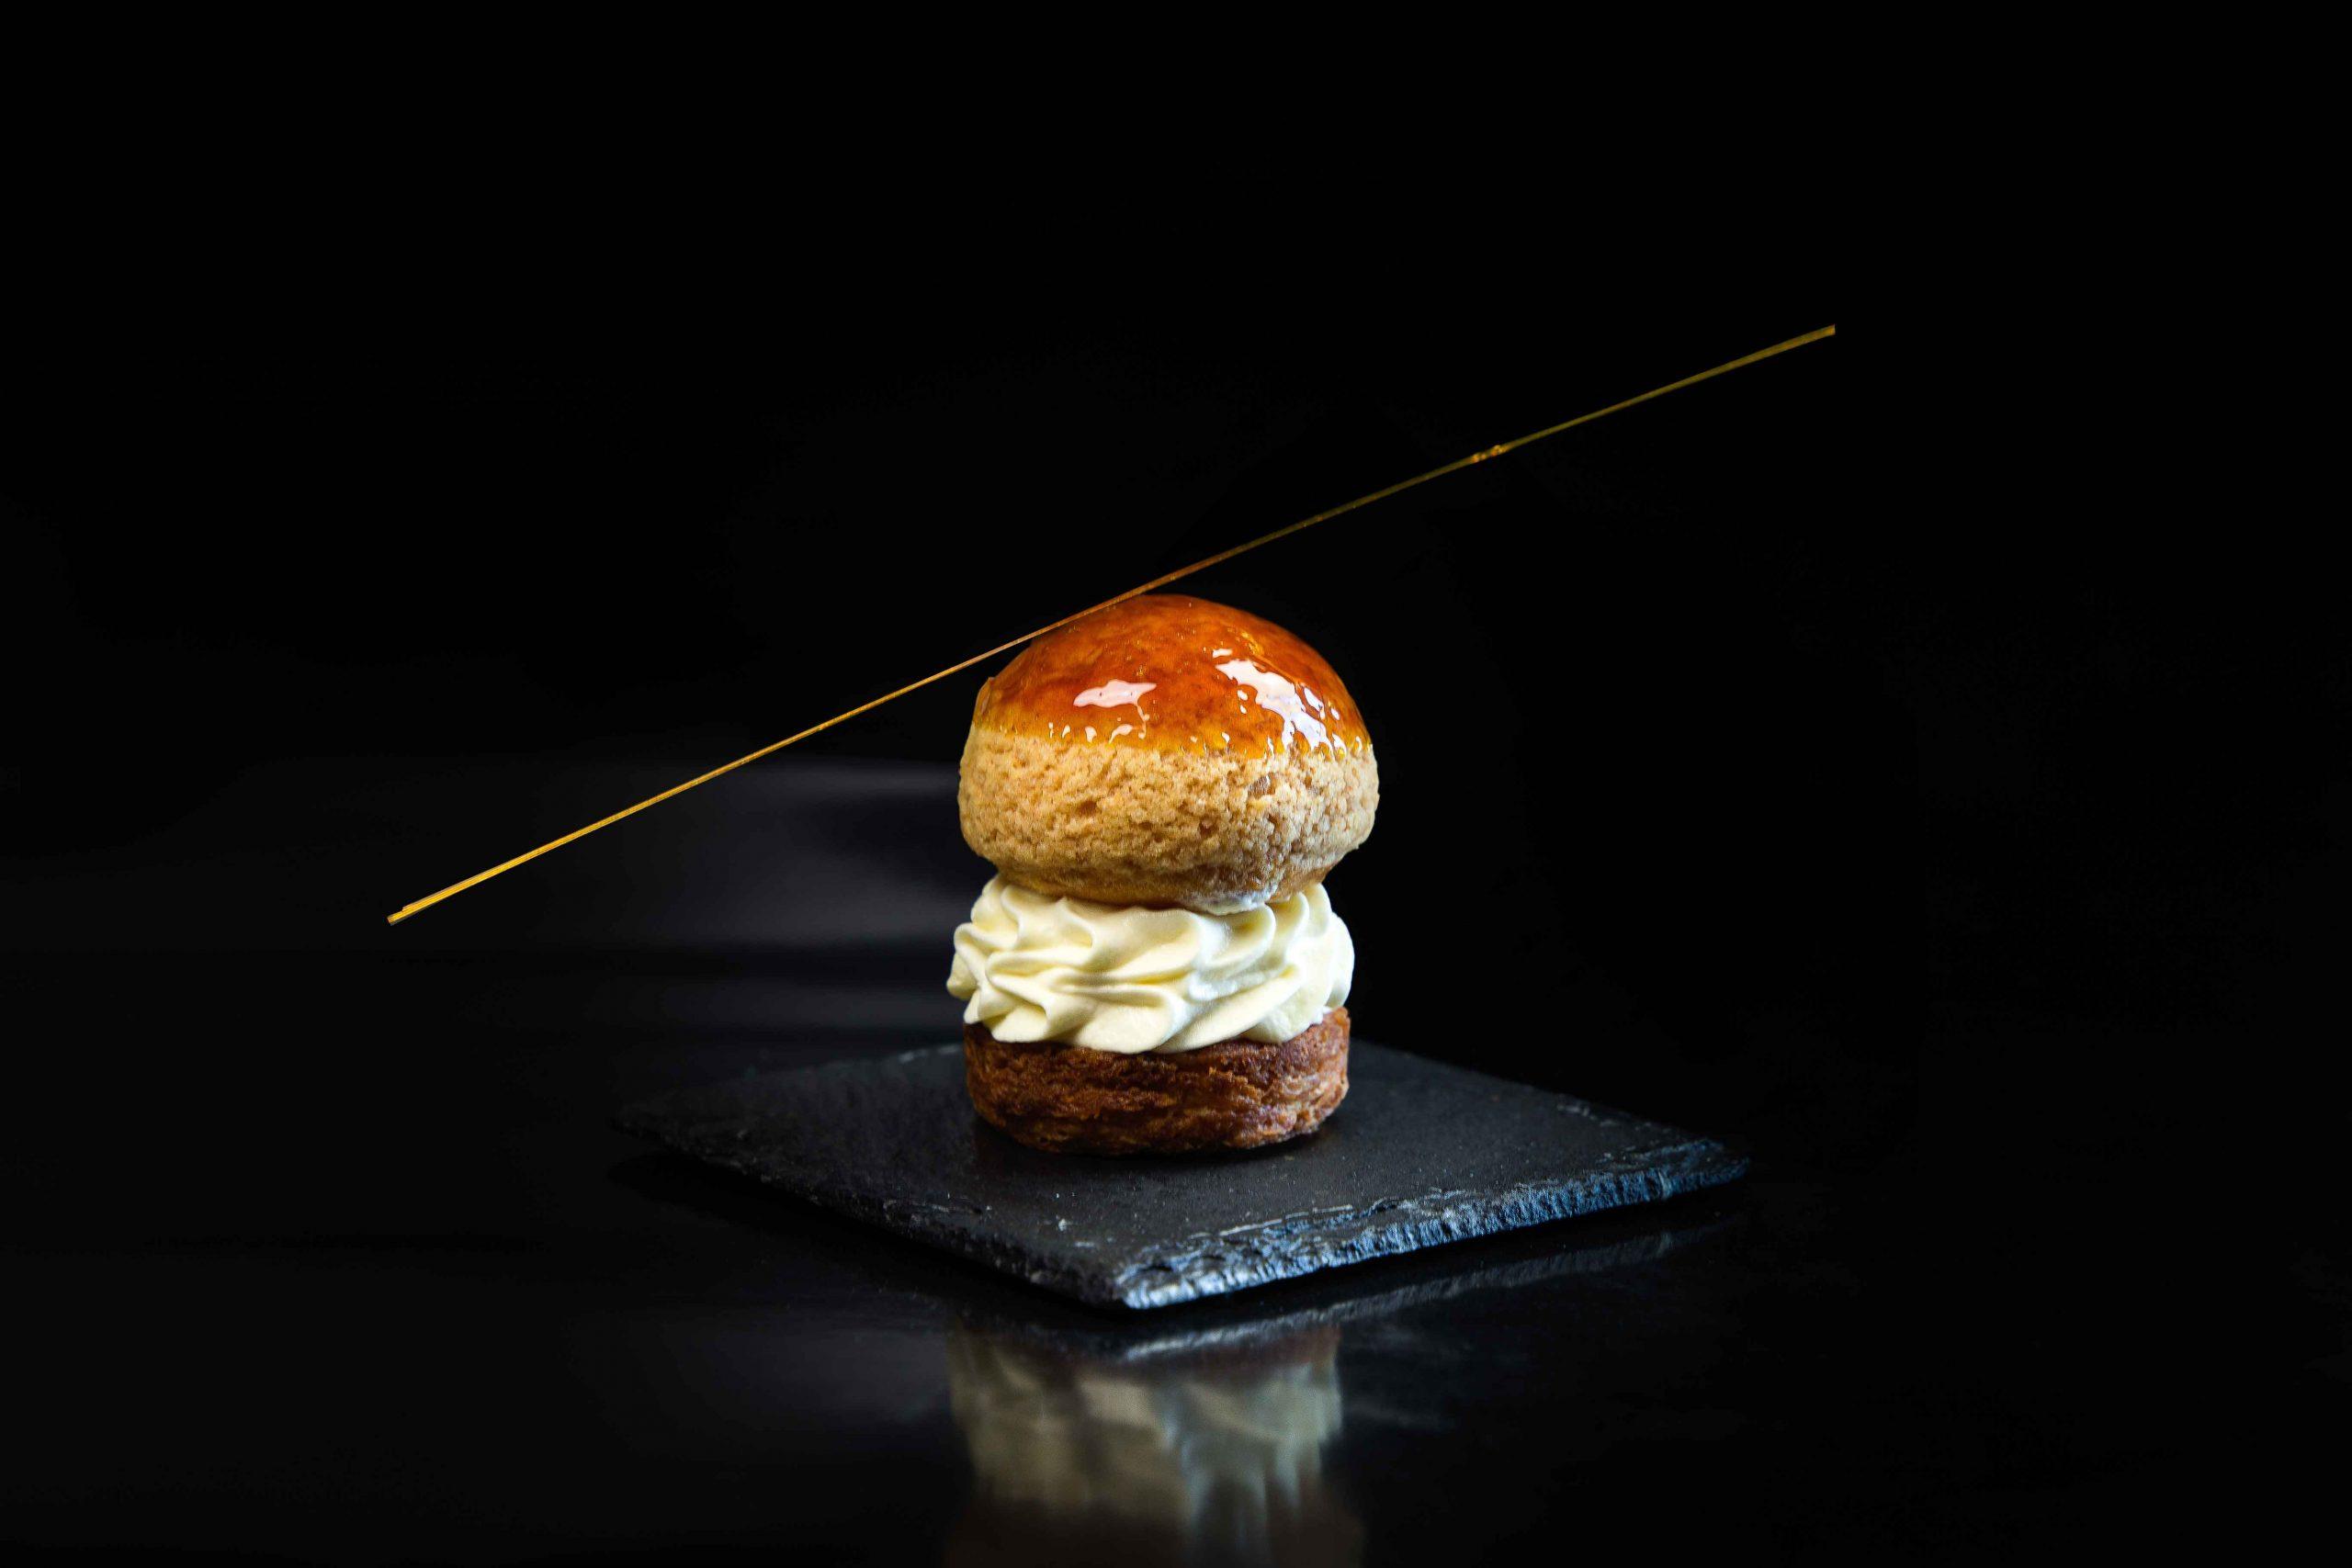 culinaire-auray-photographe-vannes-morbihan-bretagne-lorient-auray-pontivy